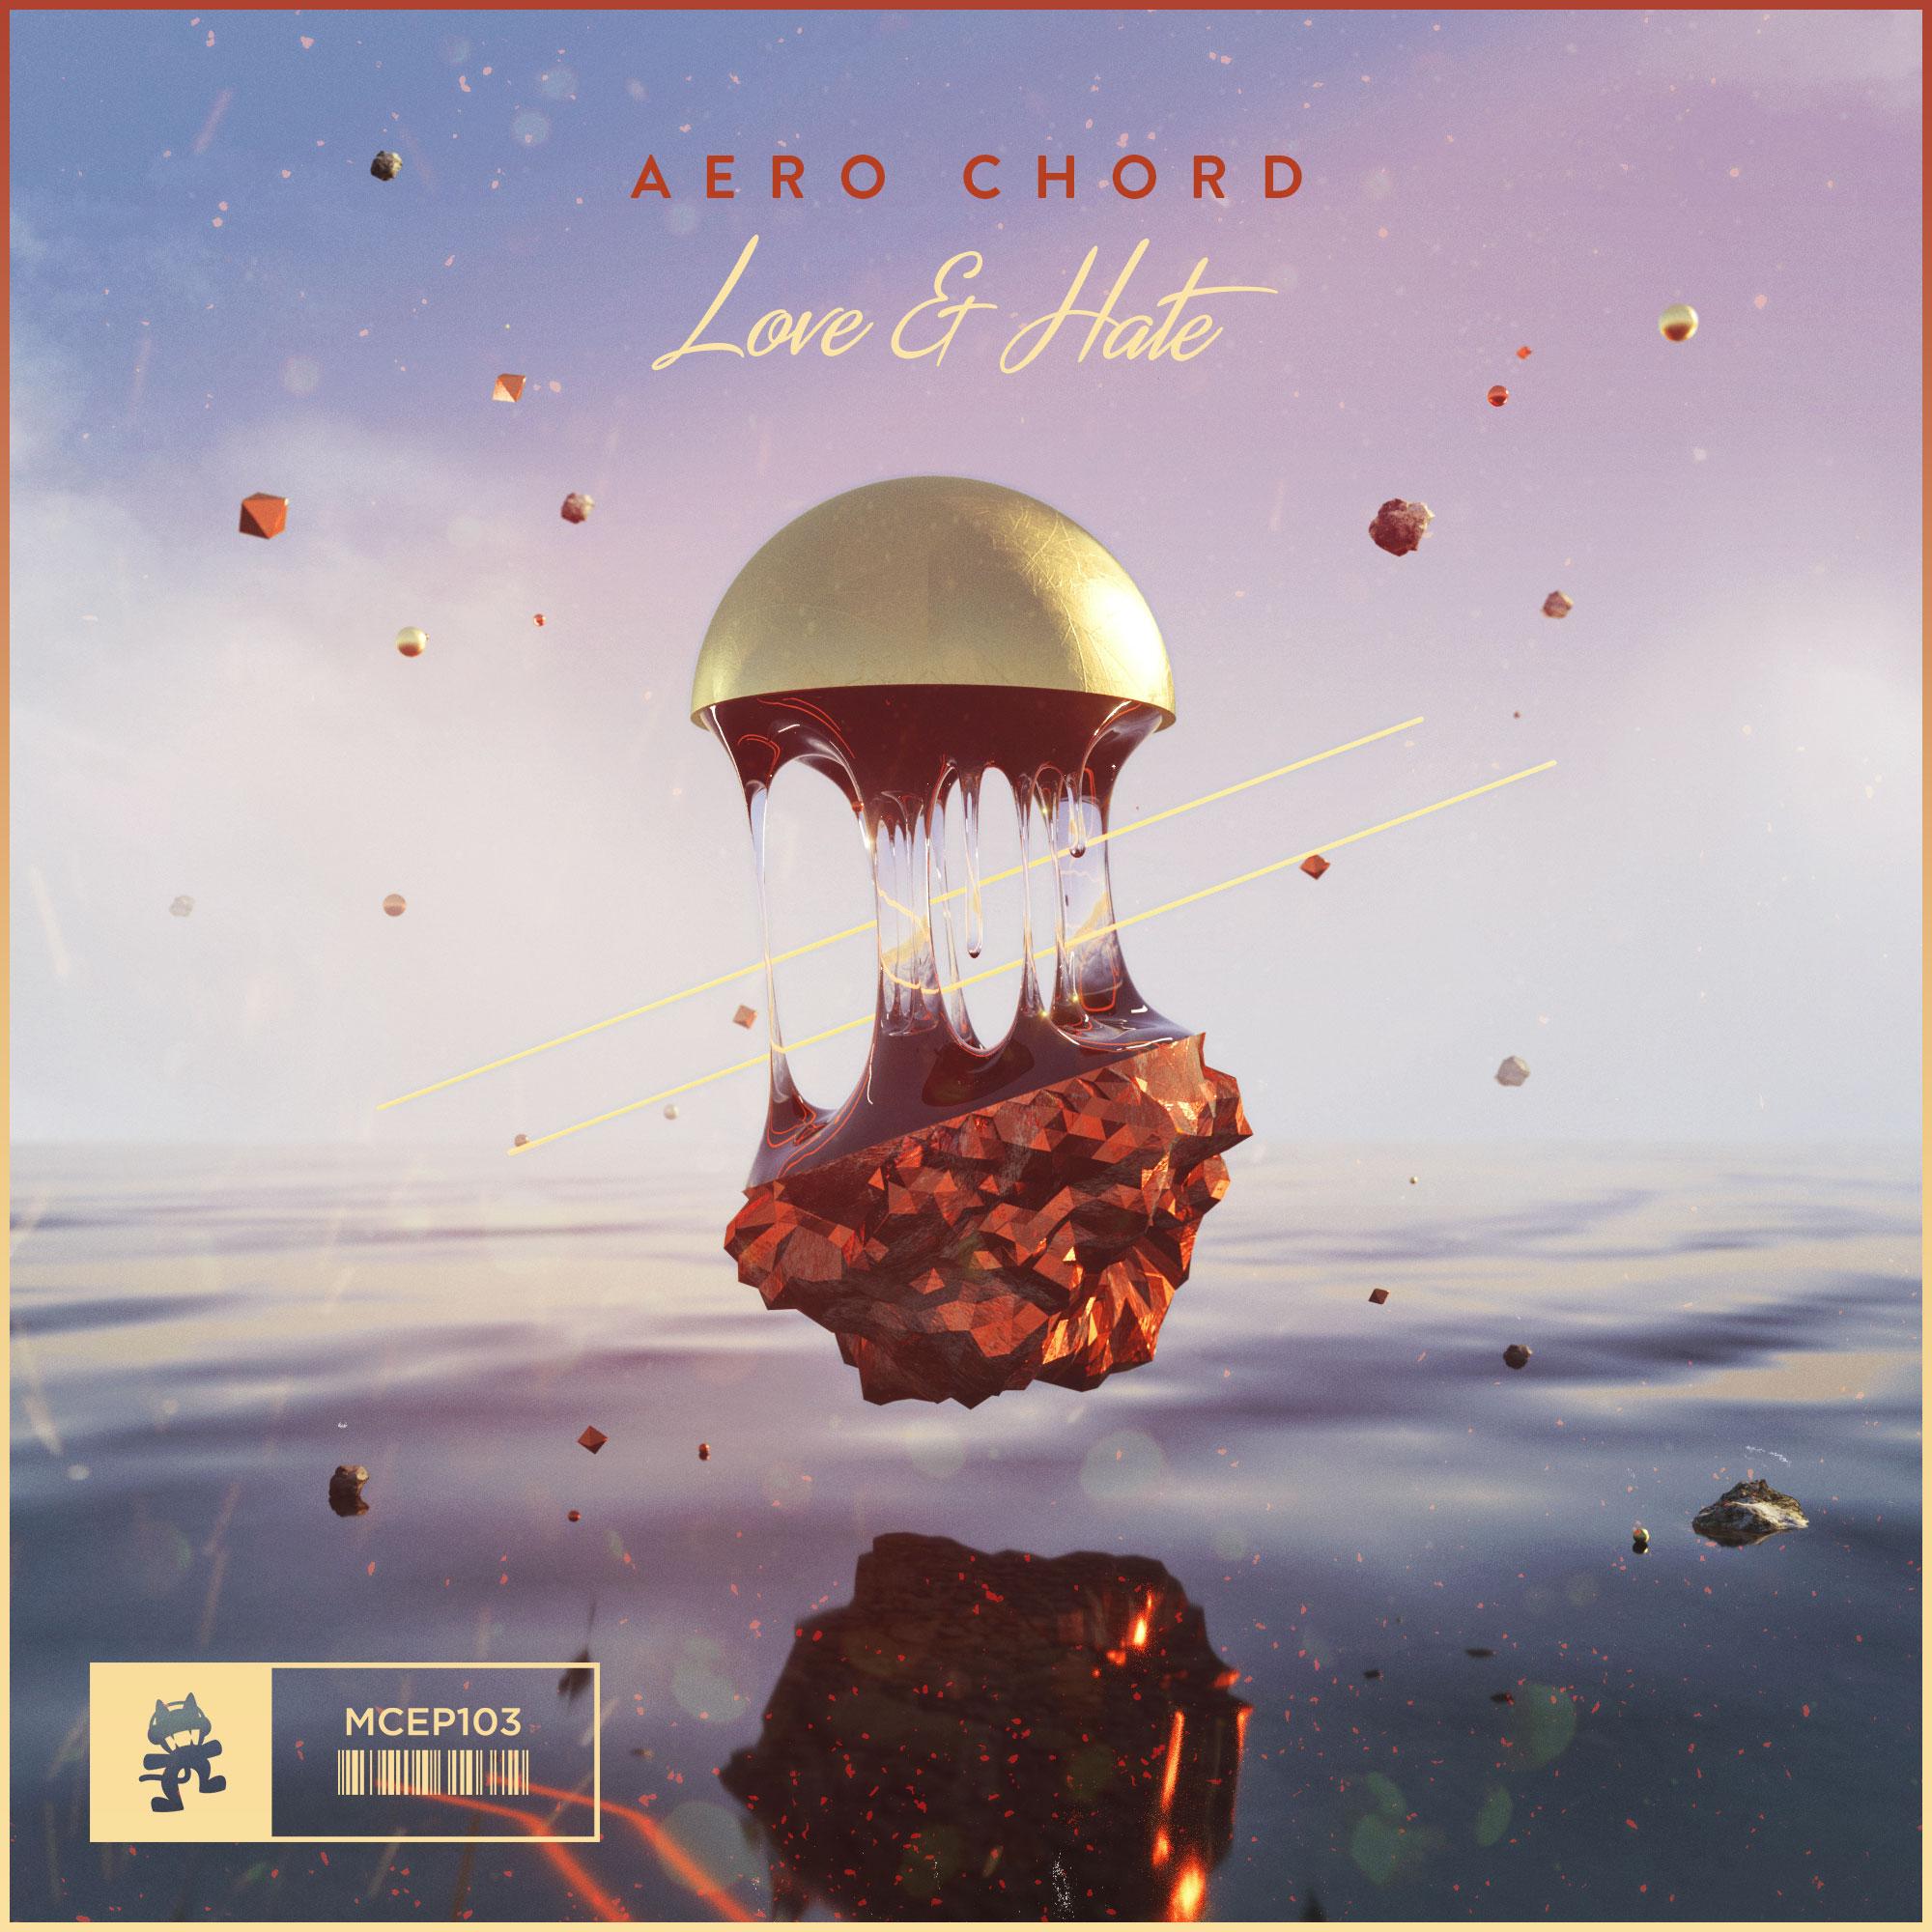 Art for Wanchu Back by Aero Chord